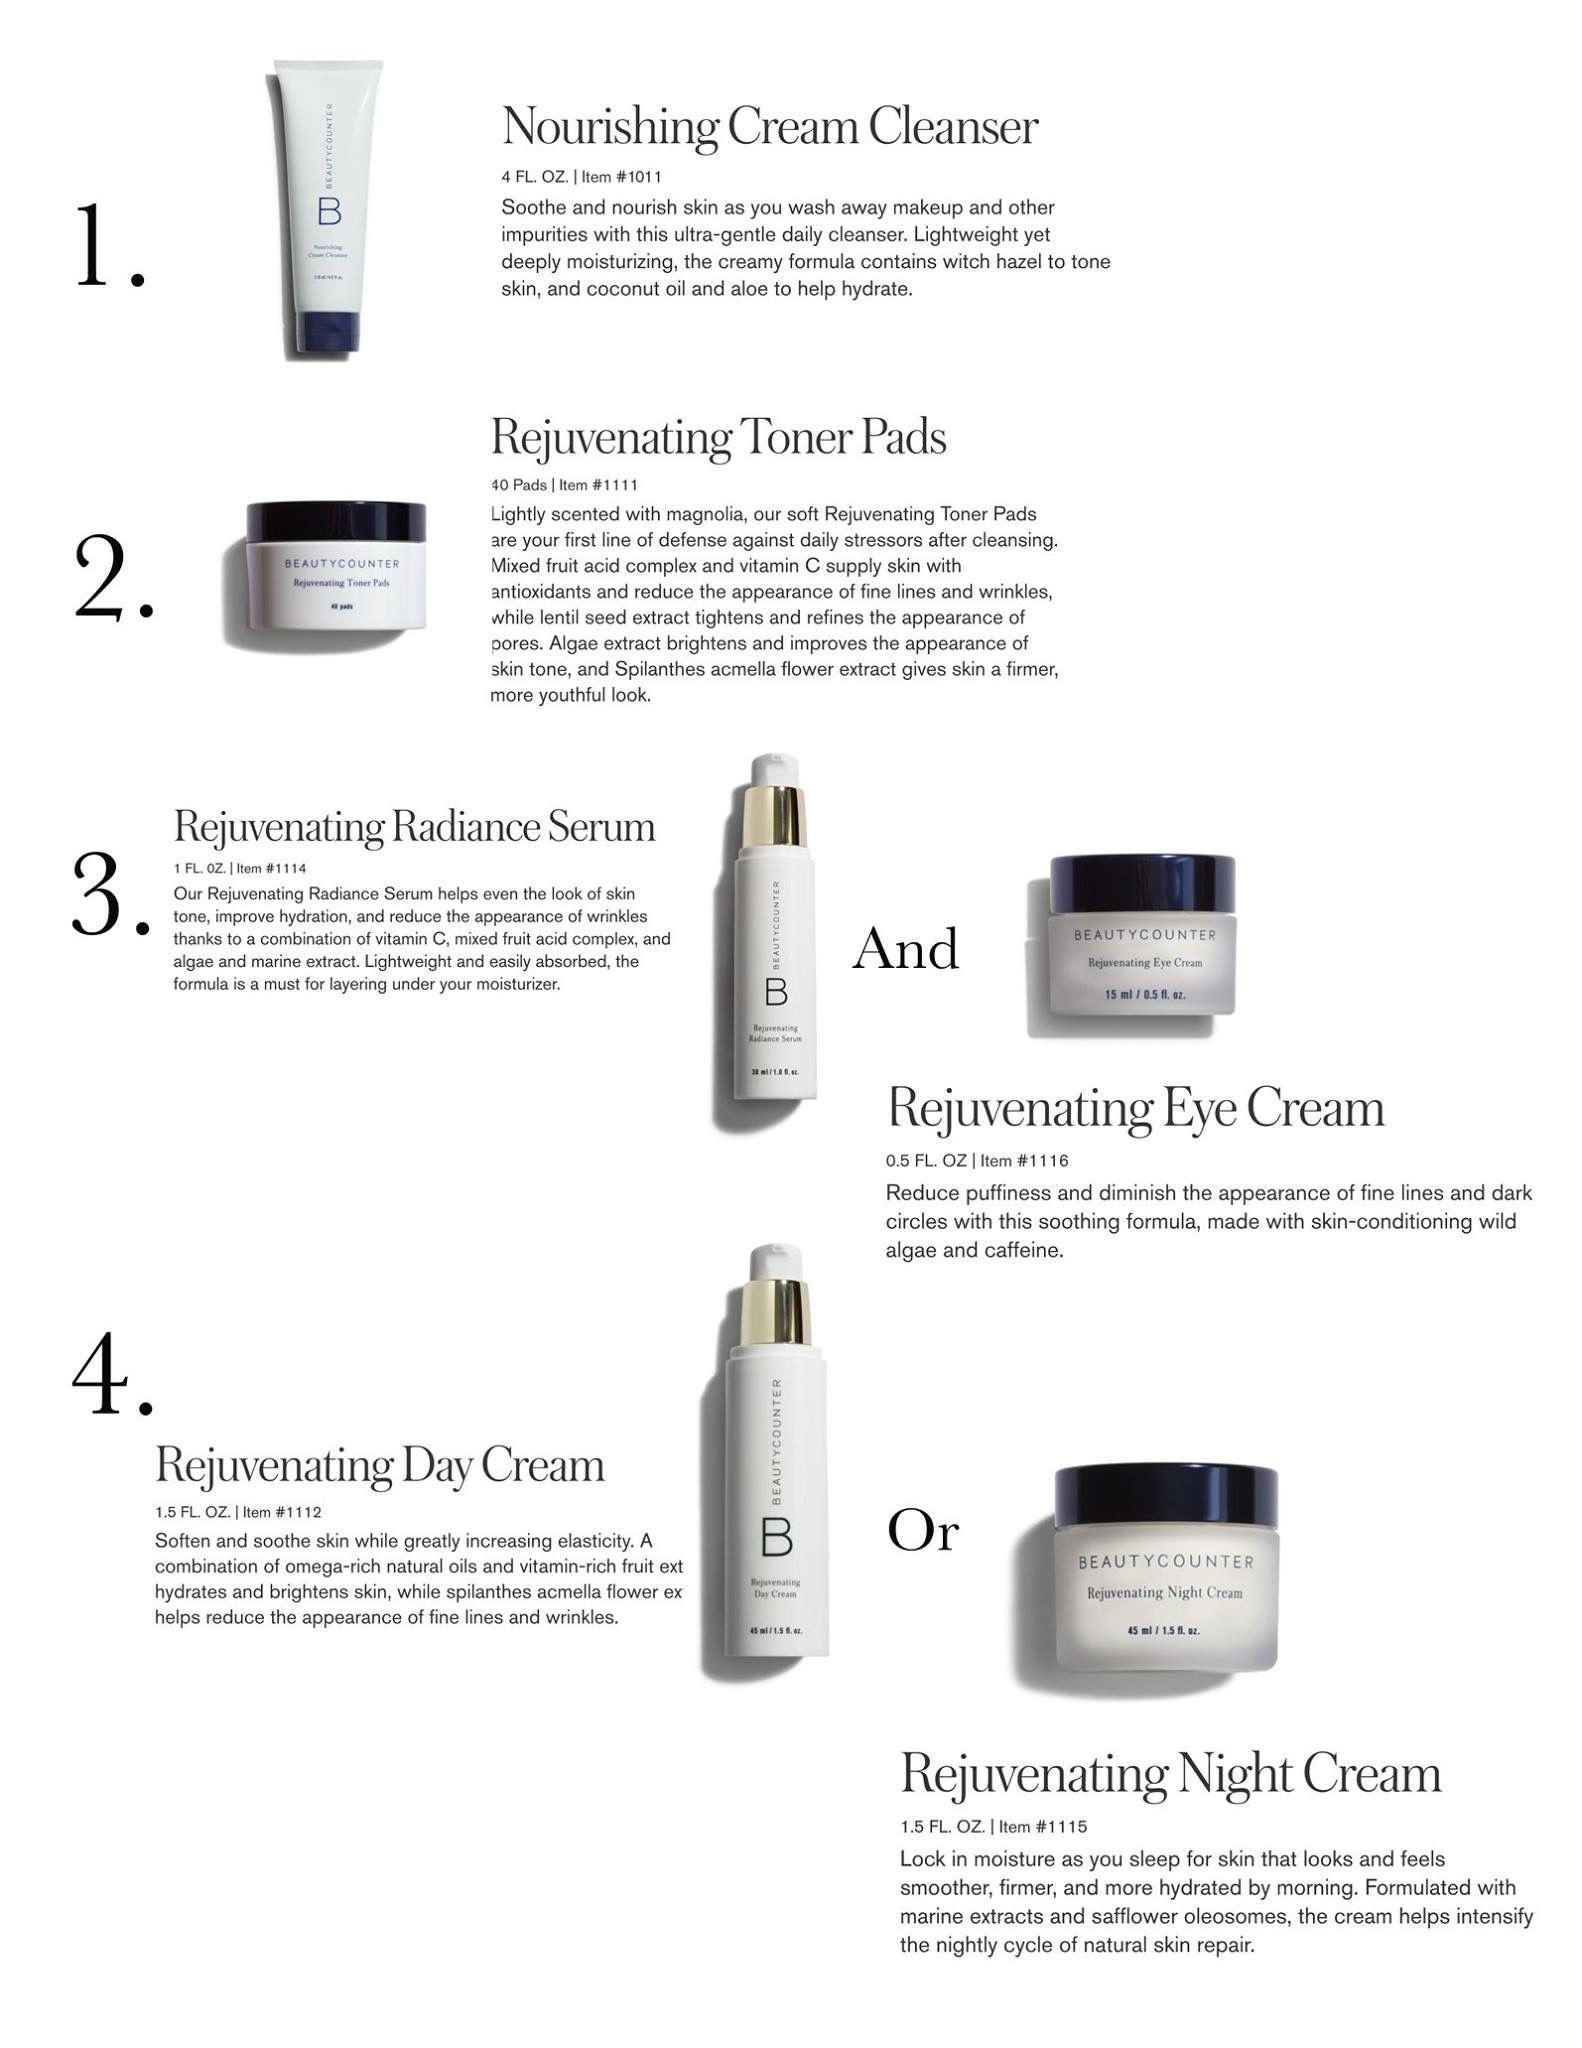 A Great Skincare Routine Www Beautycounter Com Jenniferjohnson2 Anti Aging Skin Products Skin Care Regimen Anti Aging Wrinkle Creams